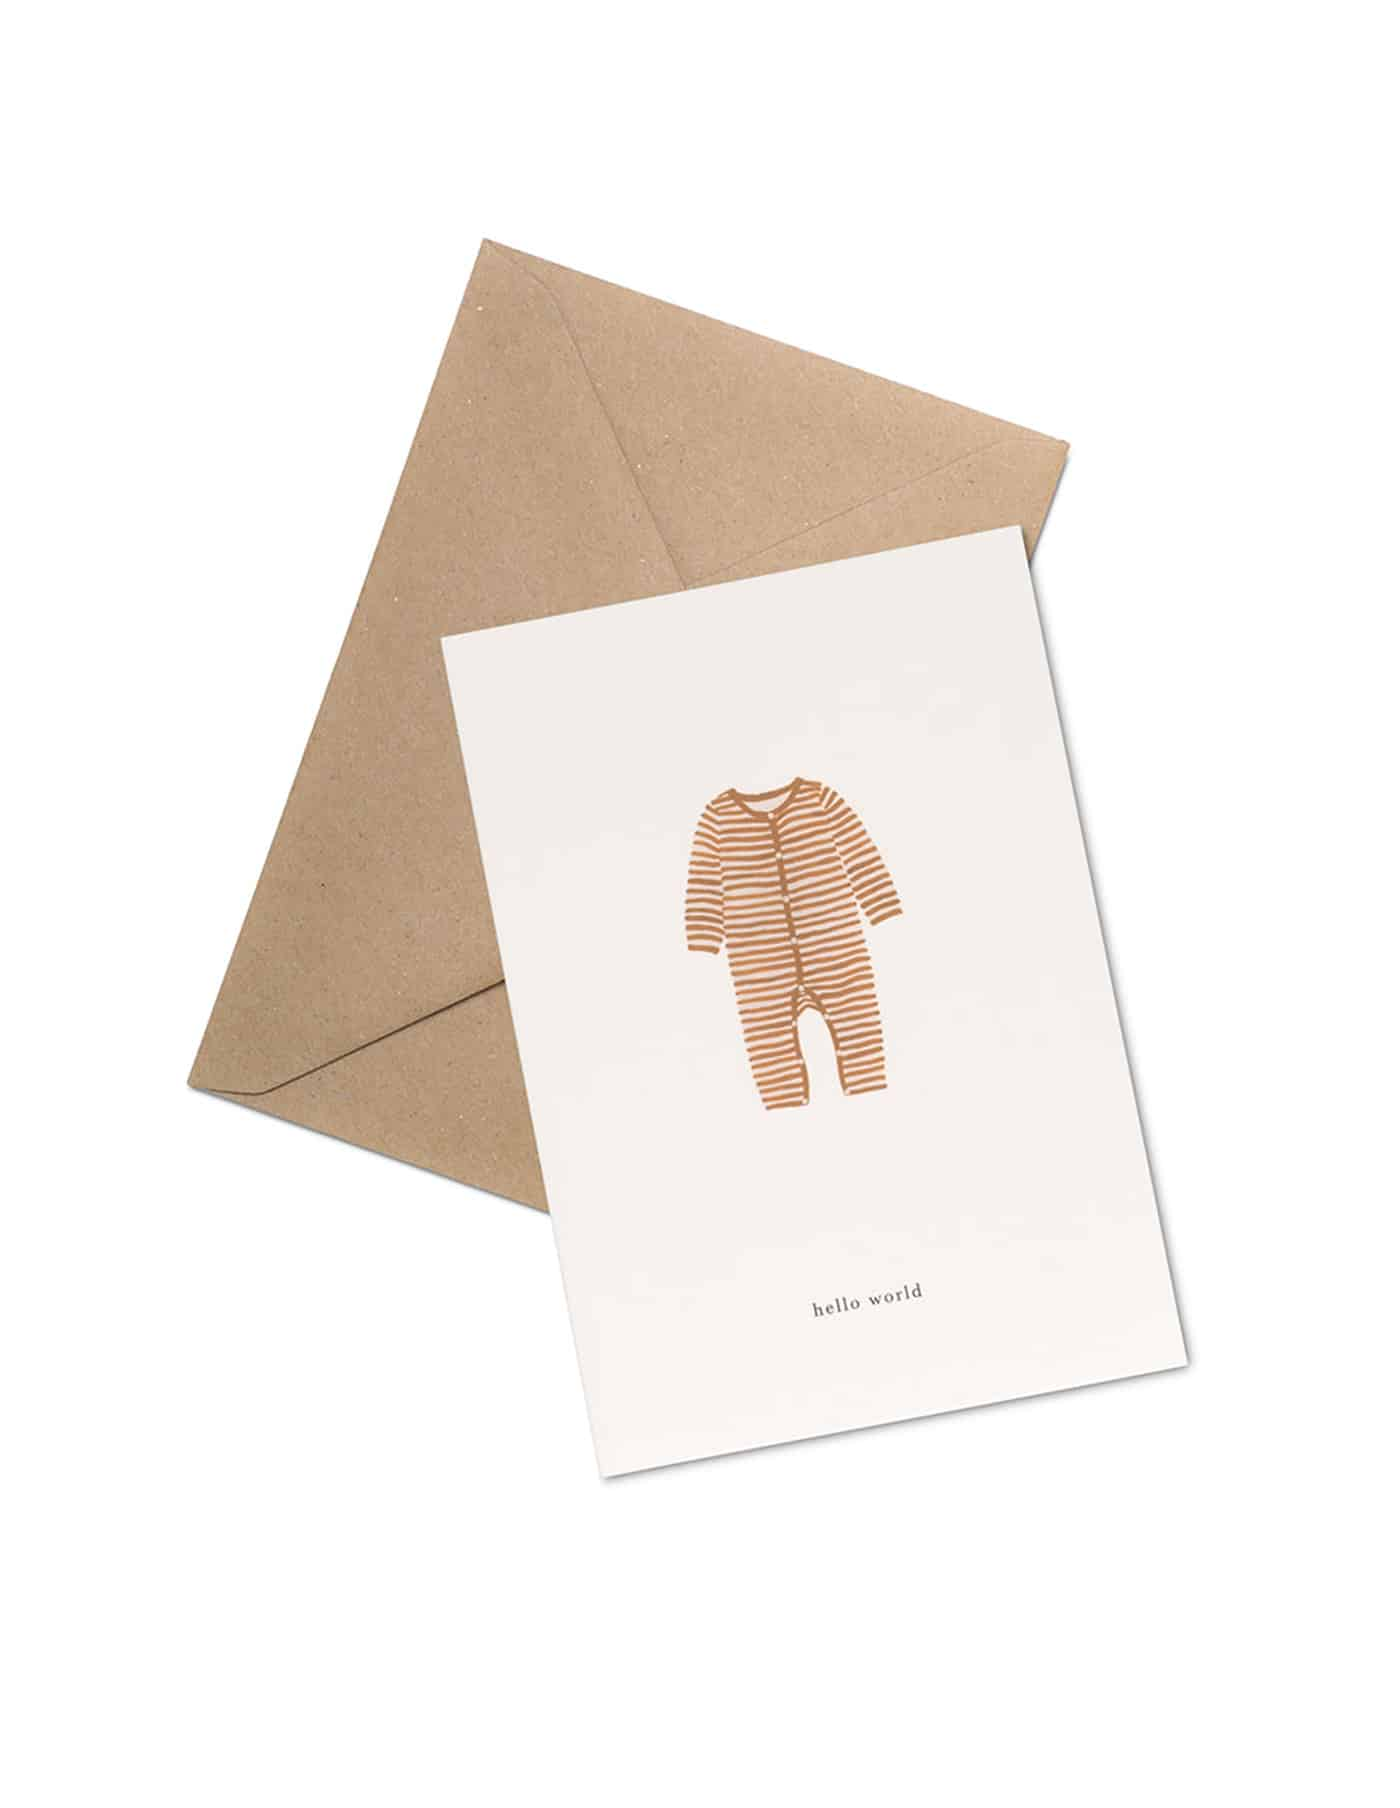 Kartotek 'welcome to the world' Greeting Card